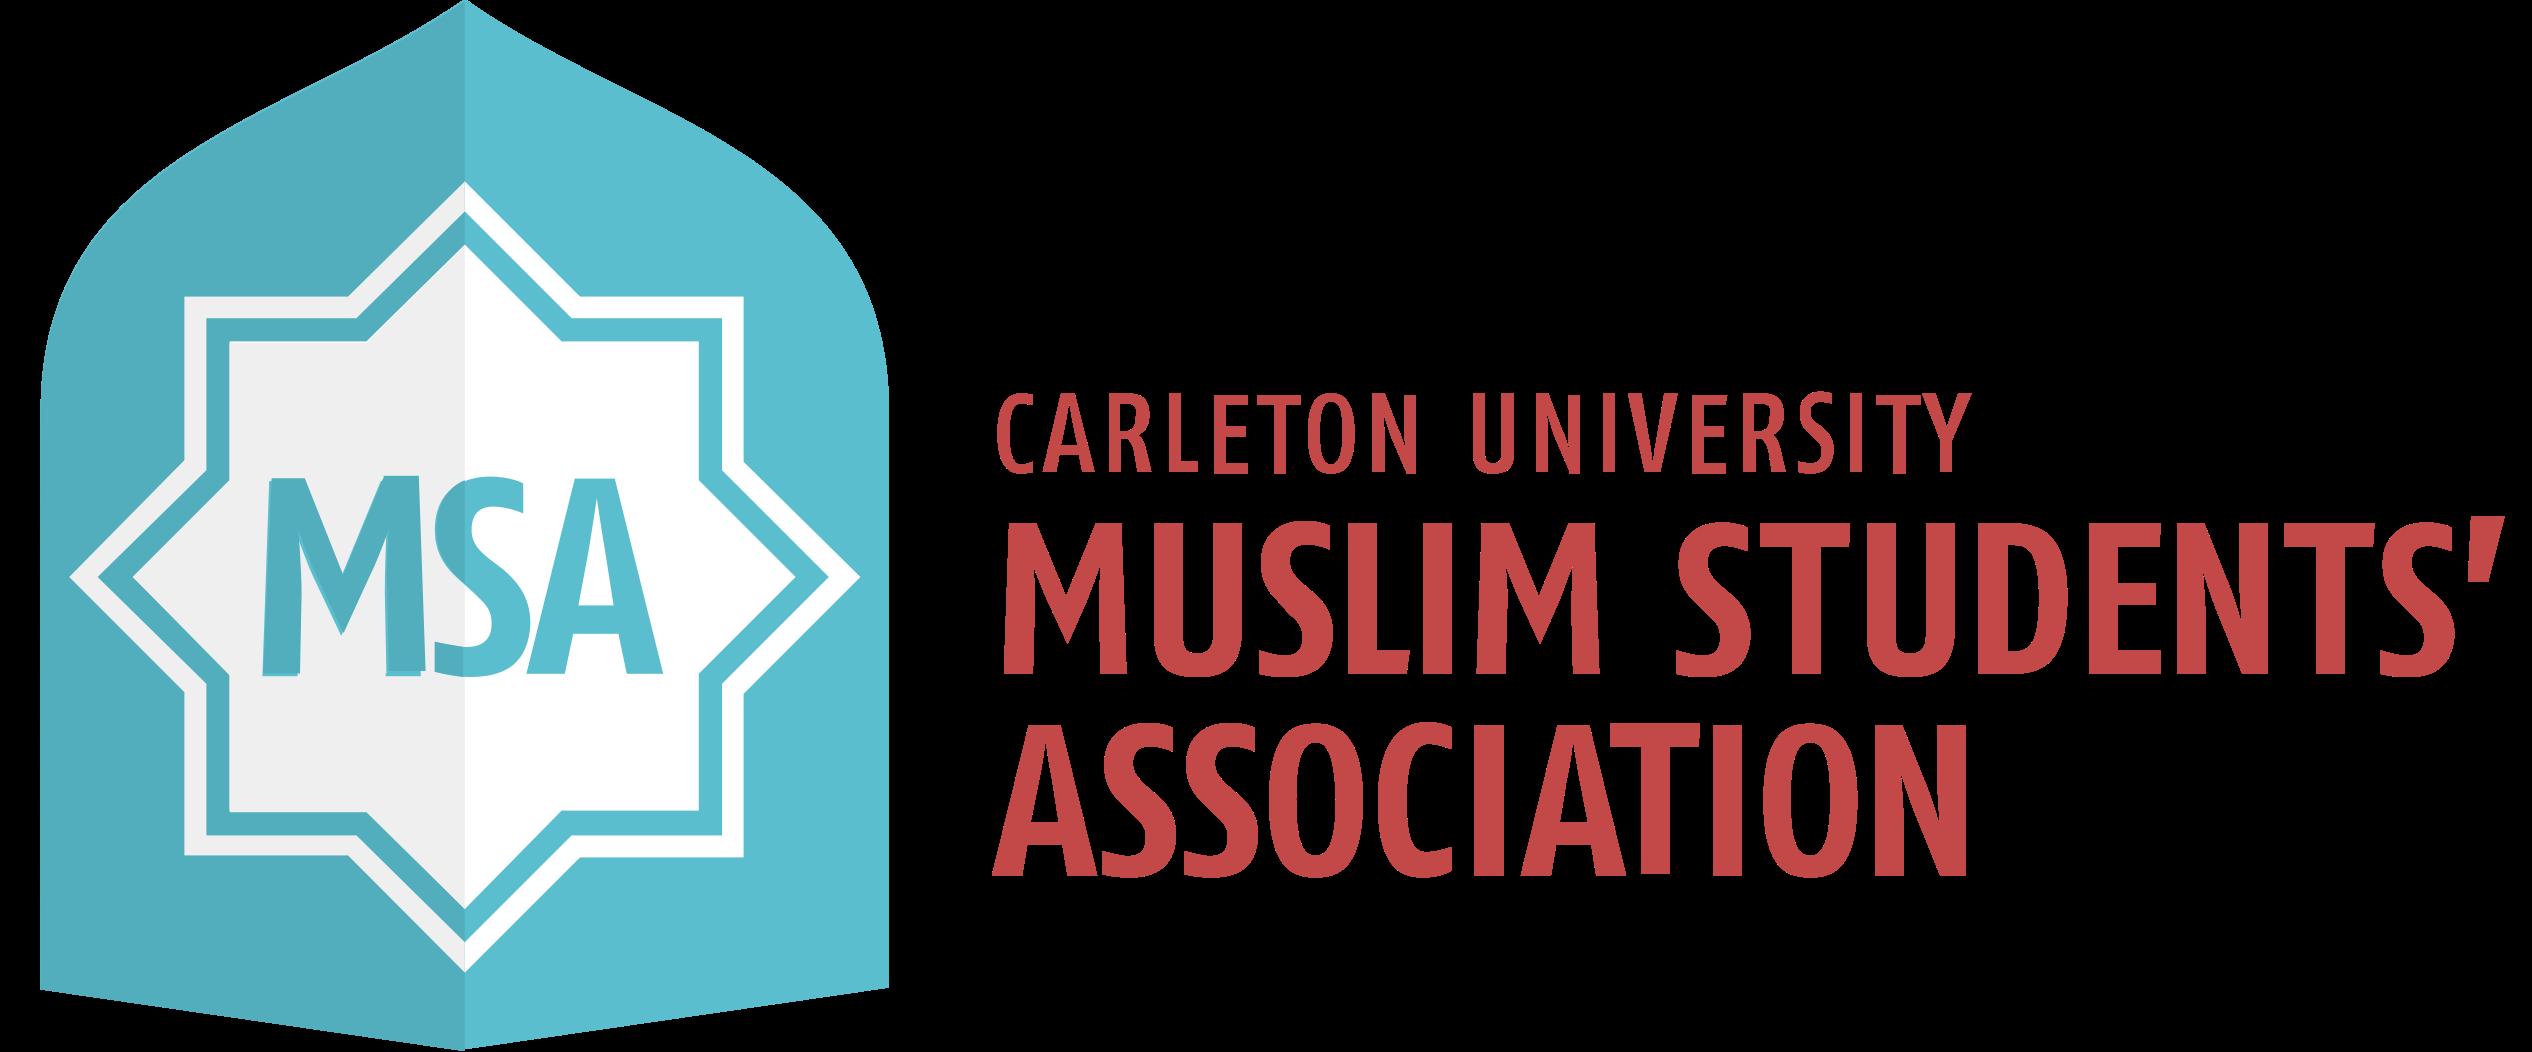 Carleton University Muslims Students' Association